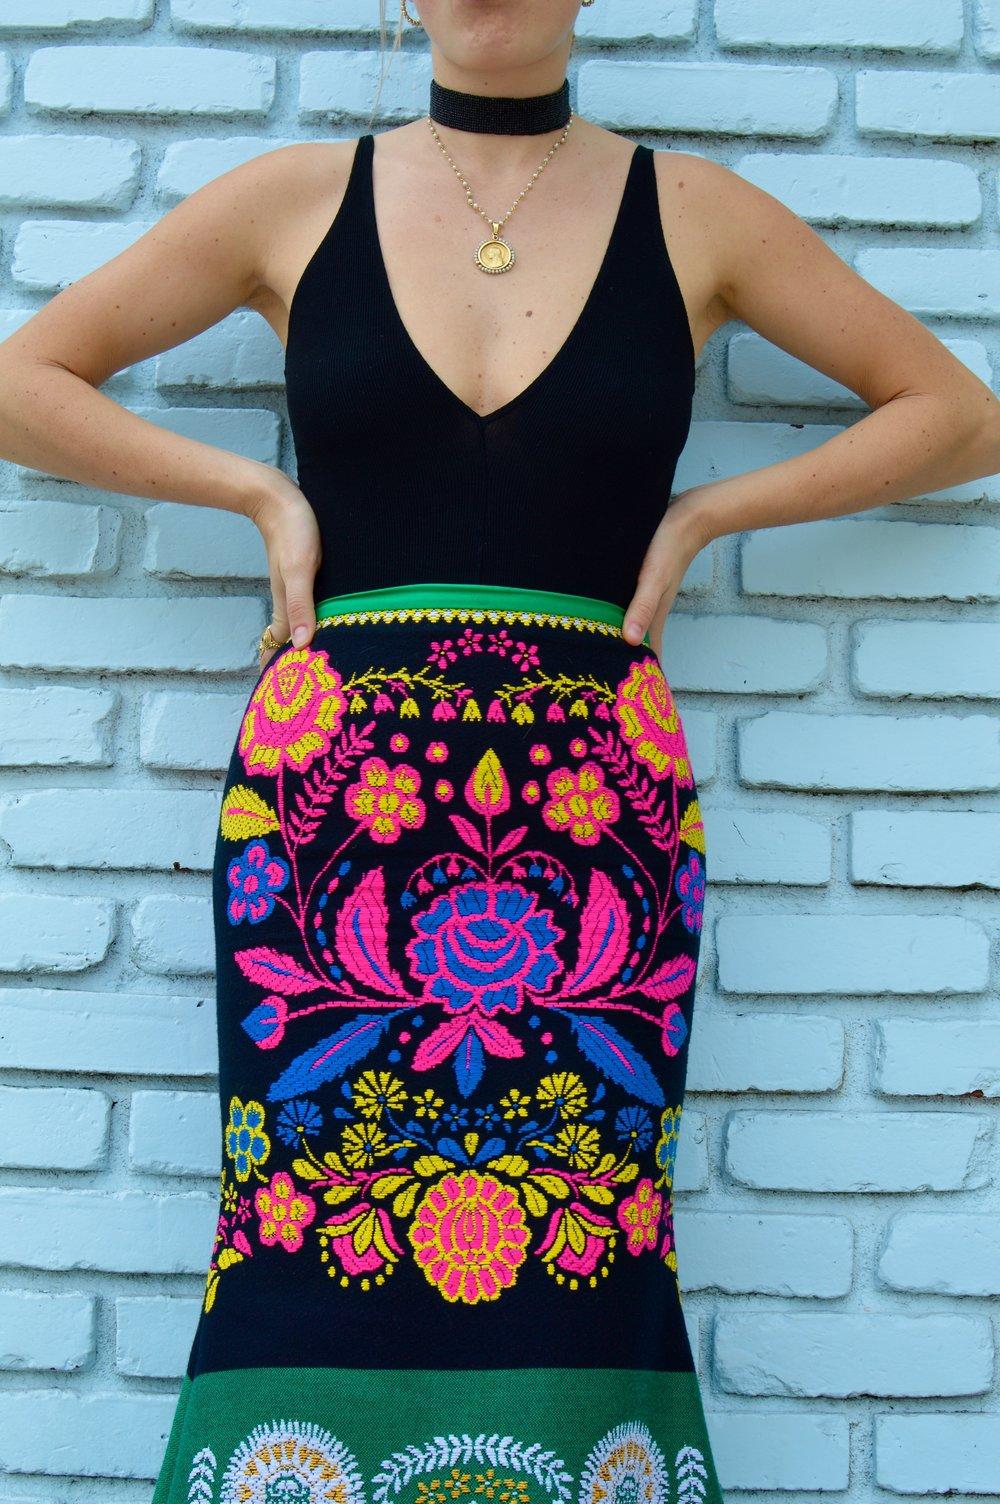 Skirt: Cynthia Rowley //Bodysuit: Brandy Melville //Choker: Sticks +Stones //Heels: Zara